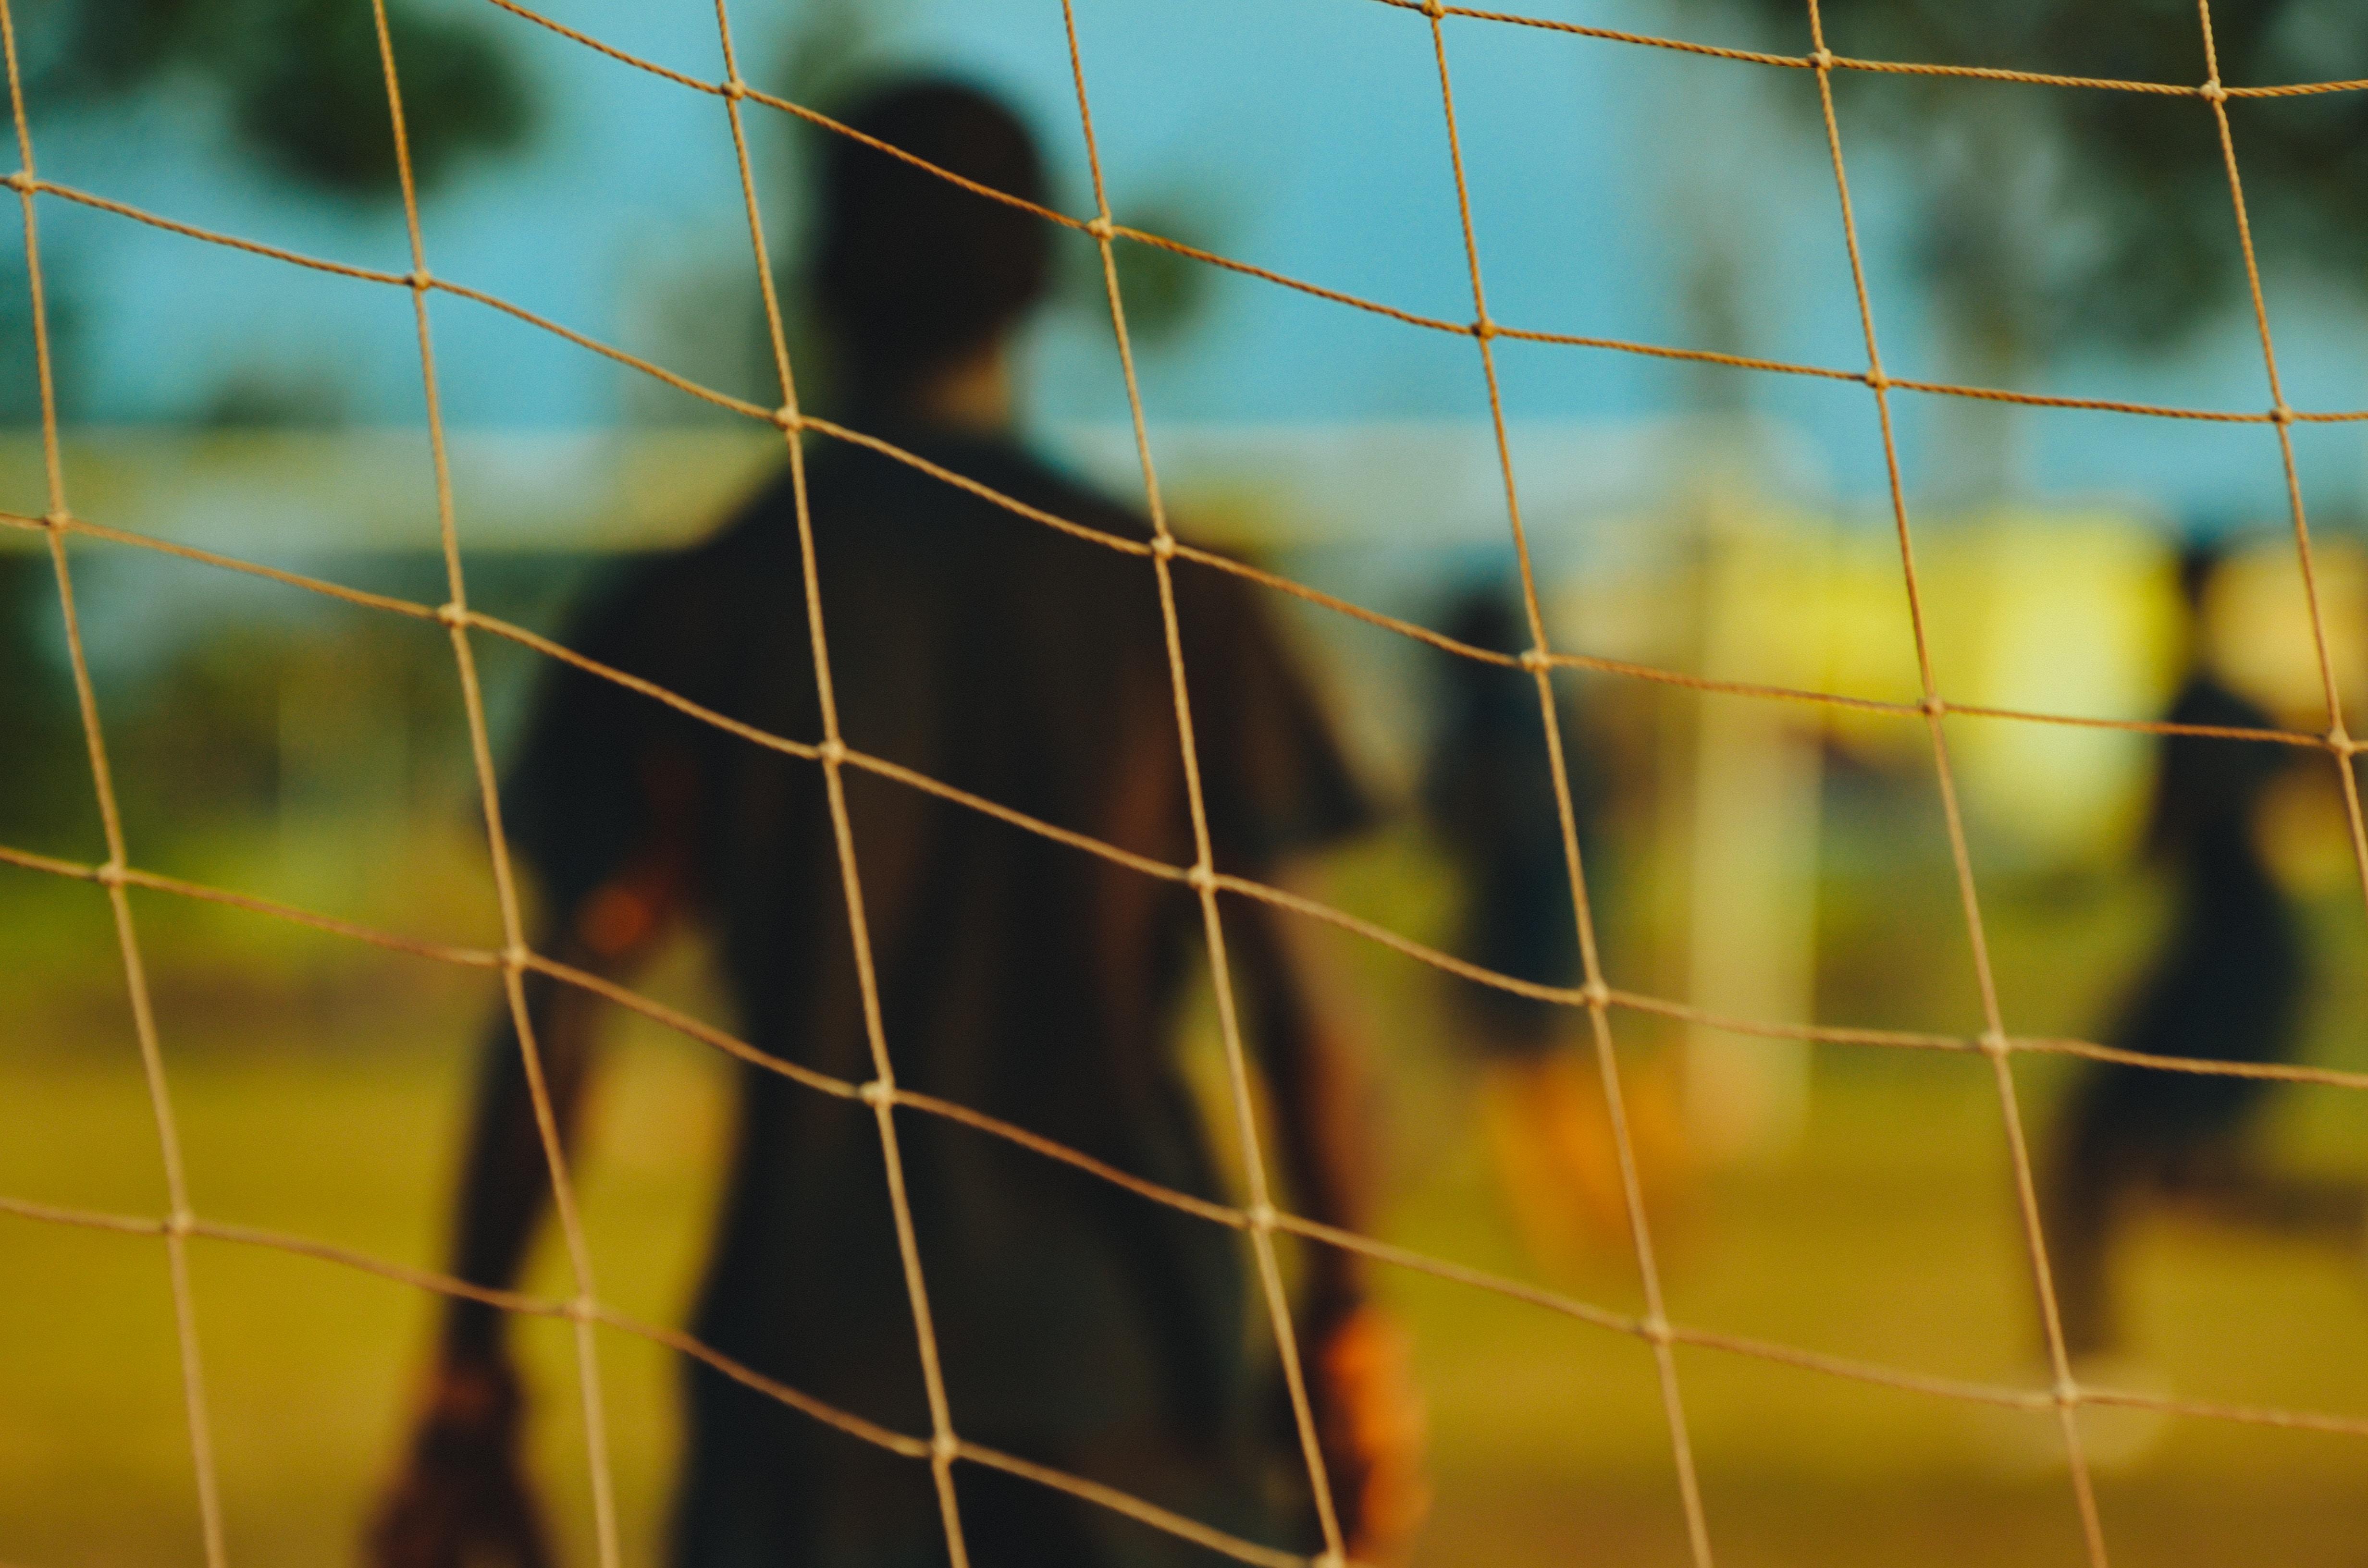 Blurred goalkeeper through the focused goal net in New York, Texas.